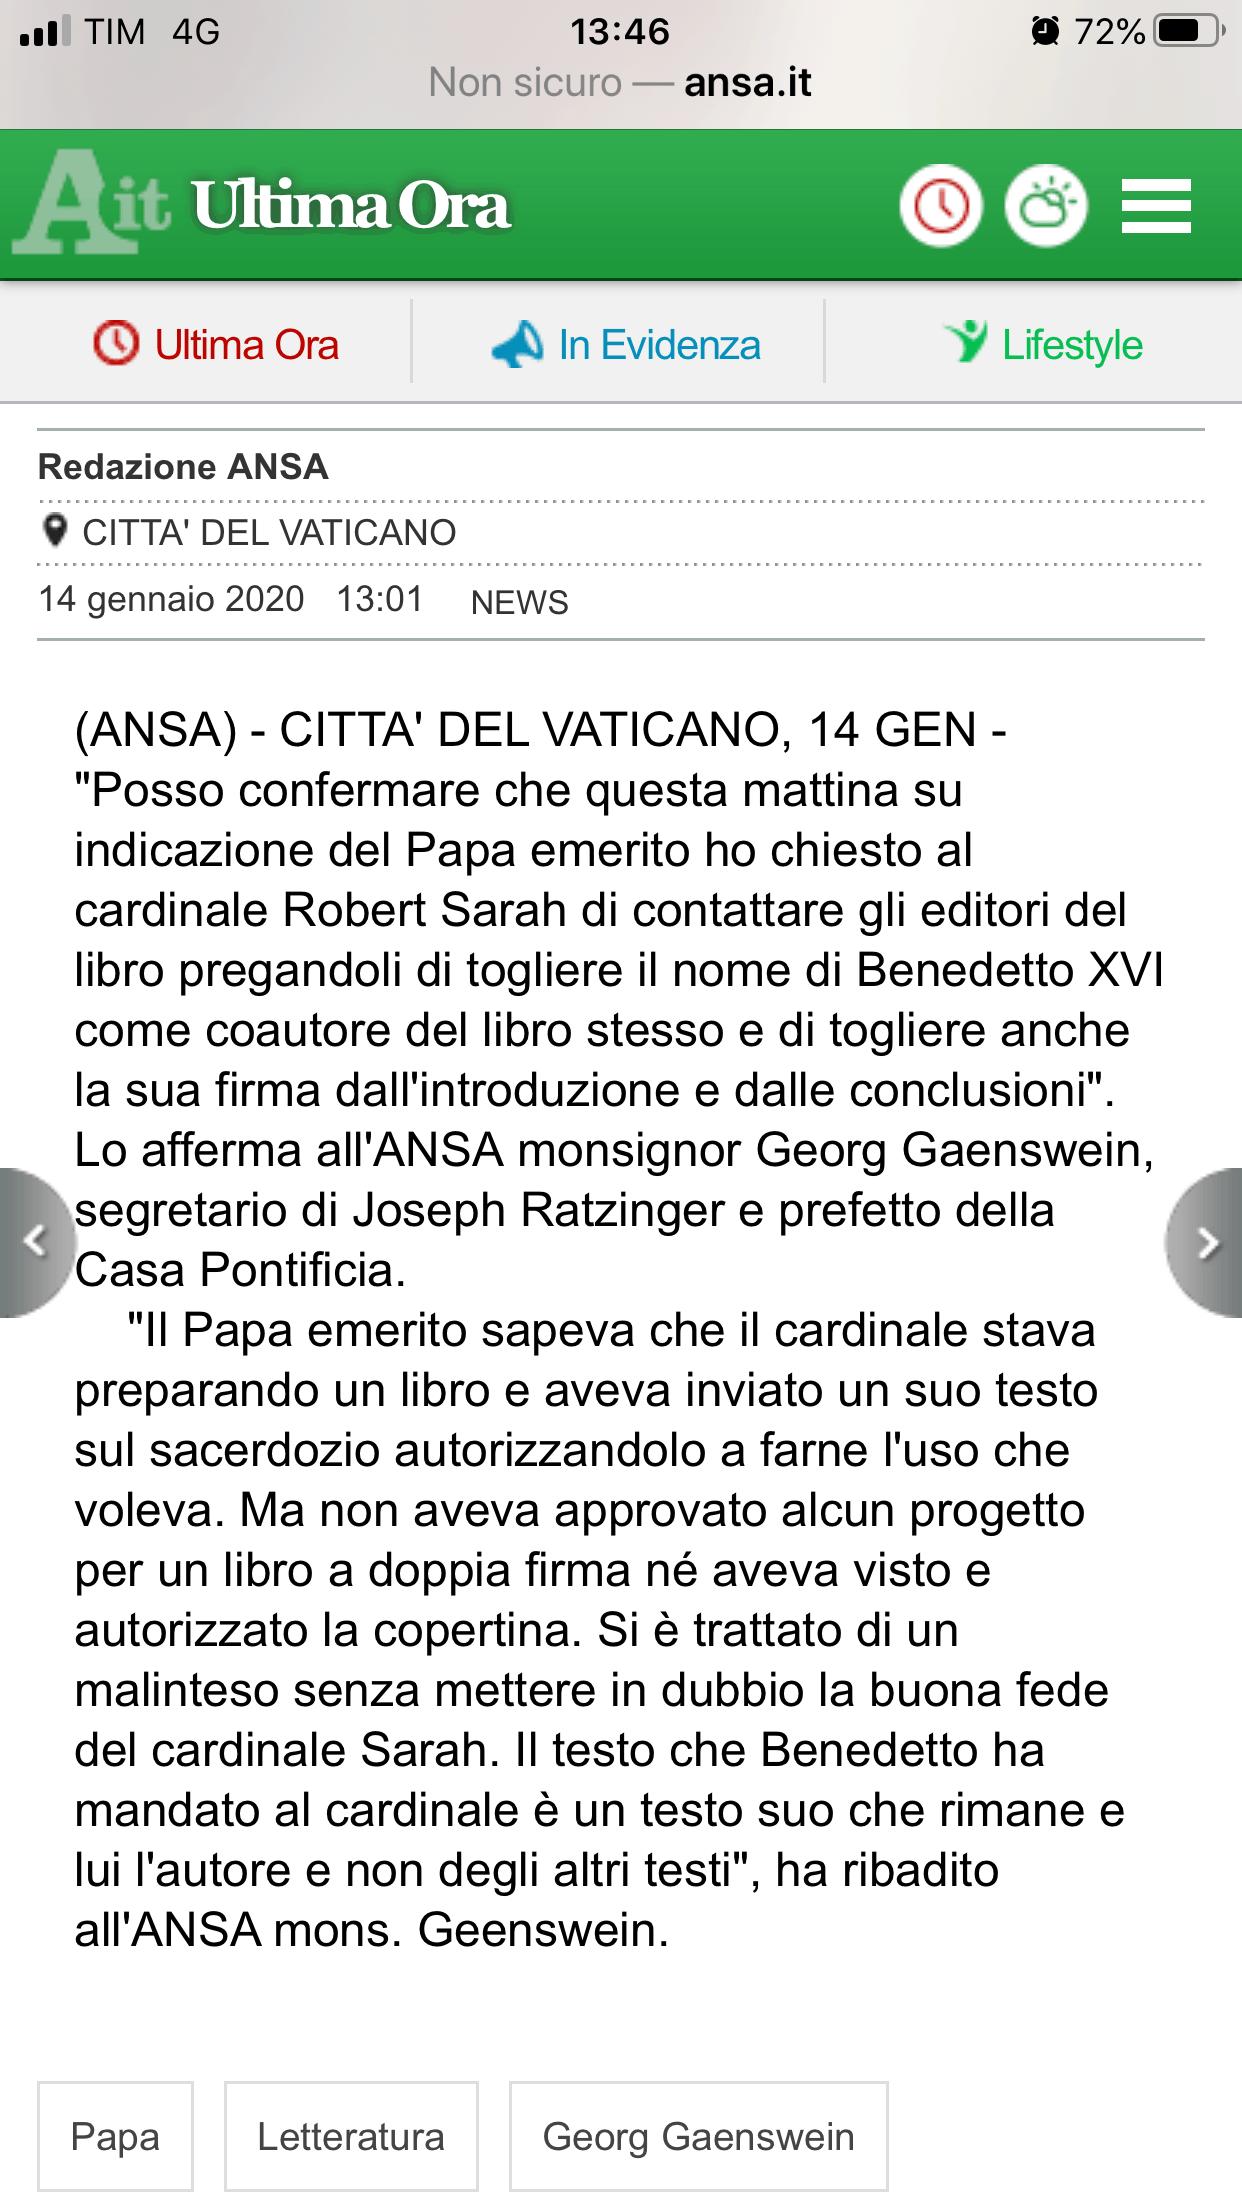 ANSA Libro Benedetto XVI - Sarah